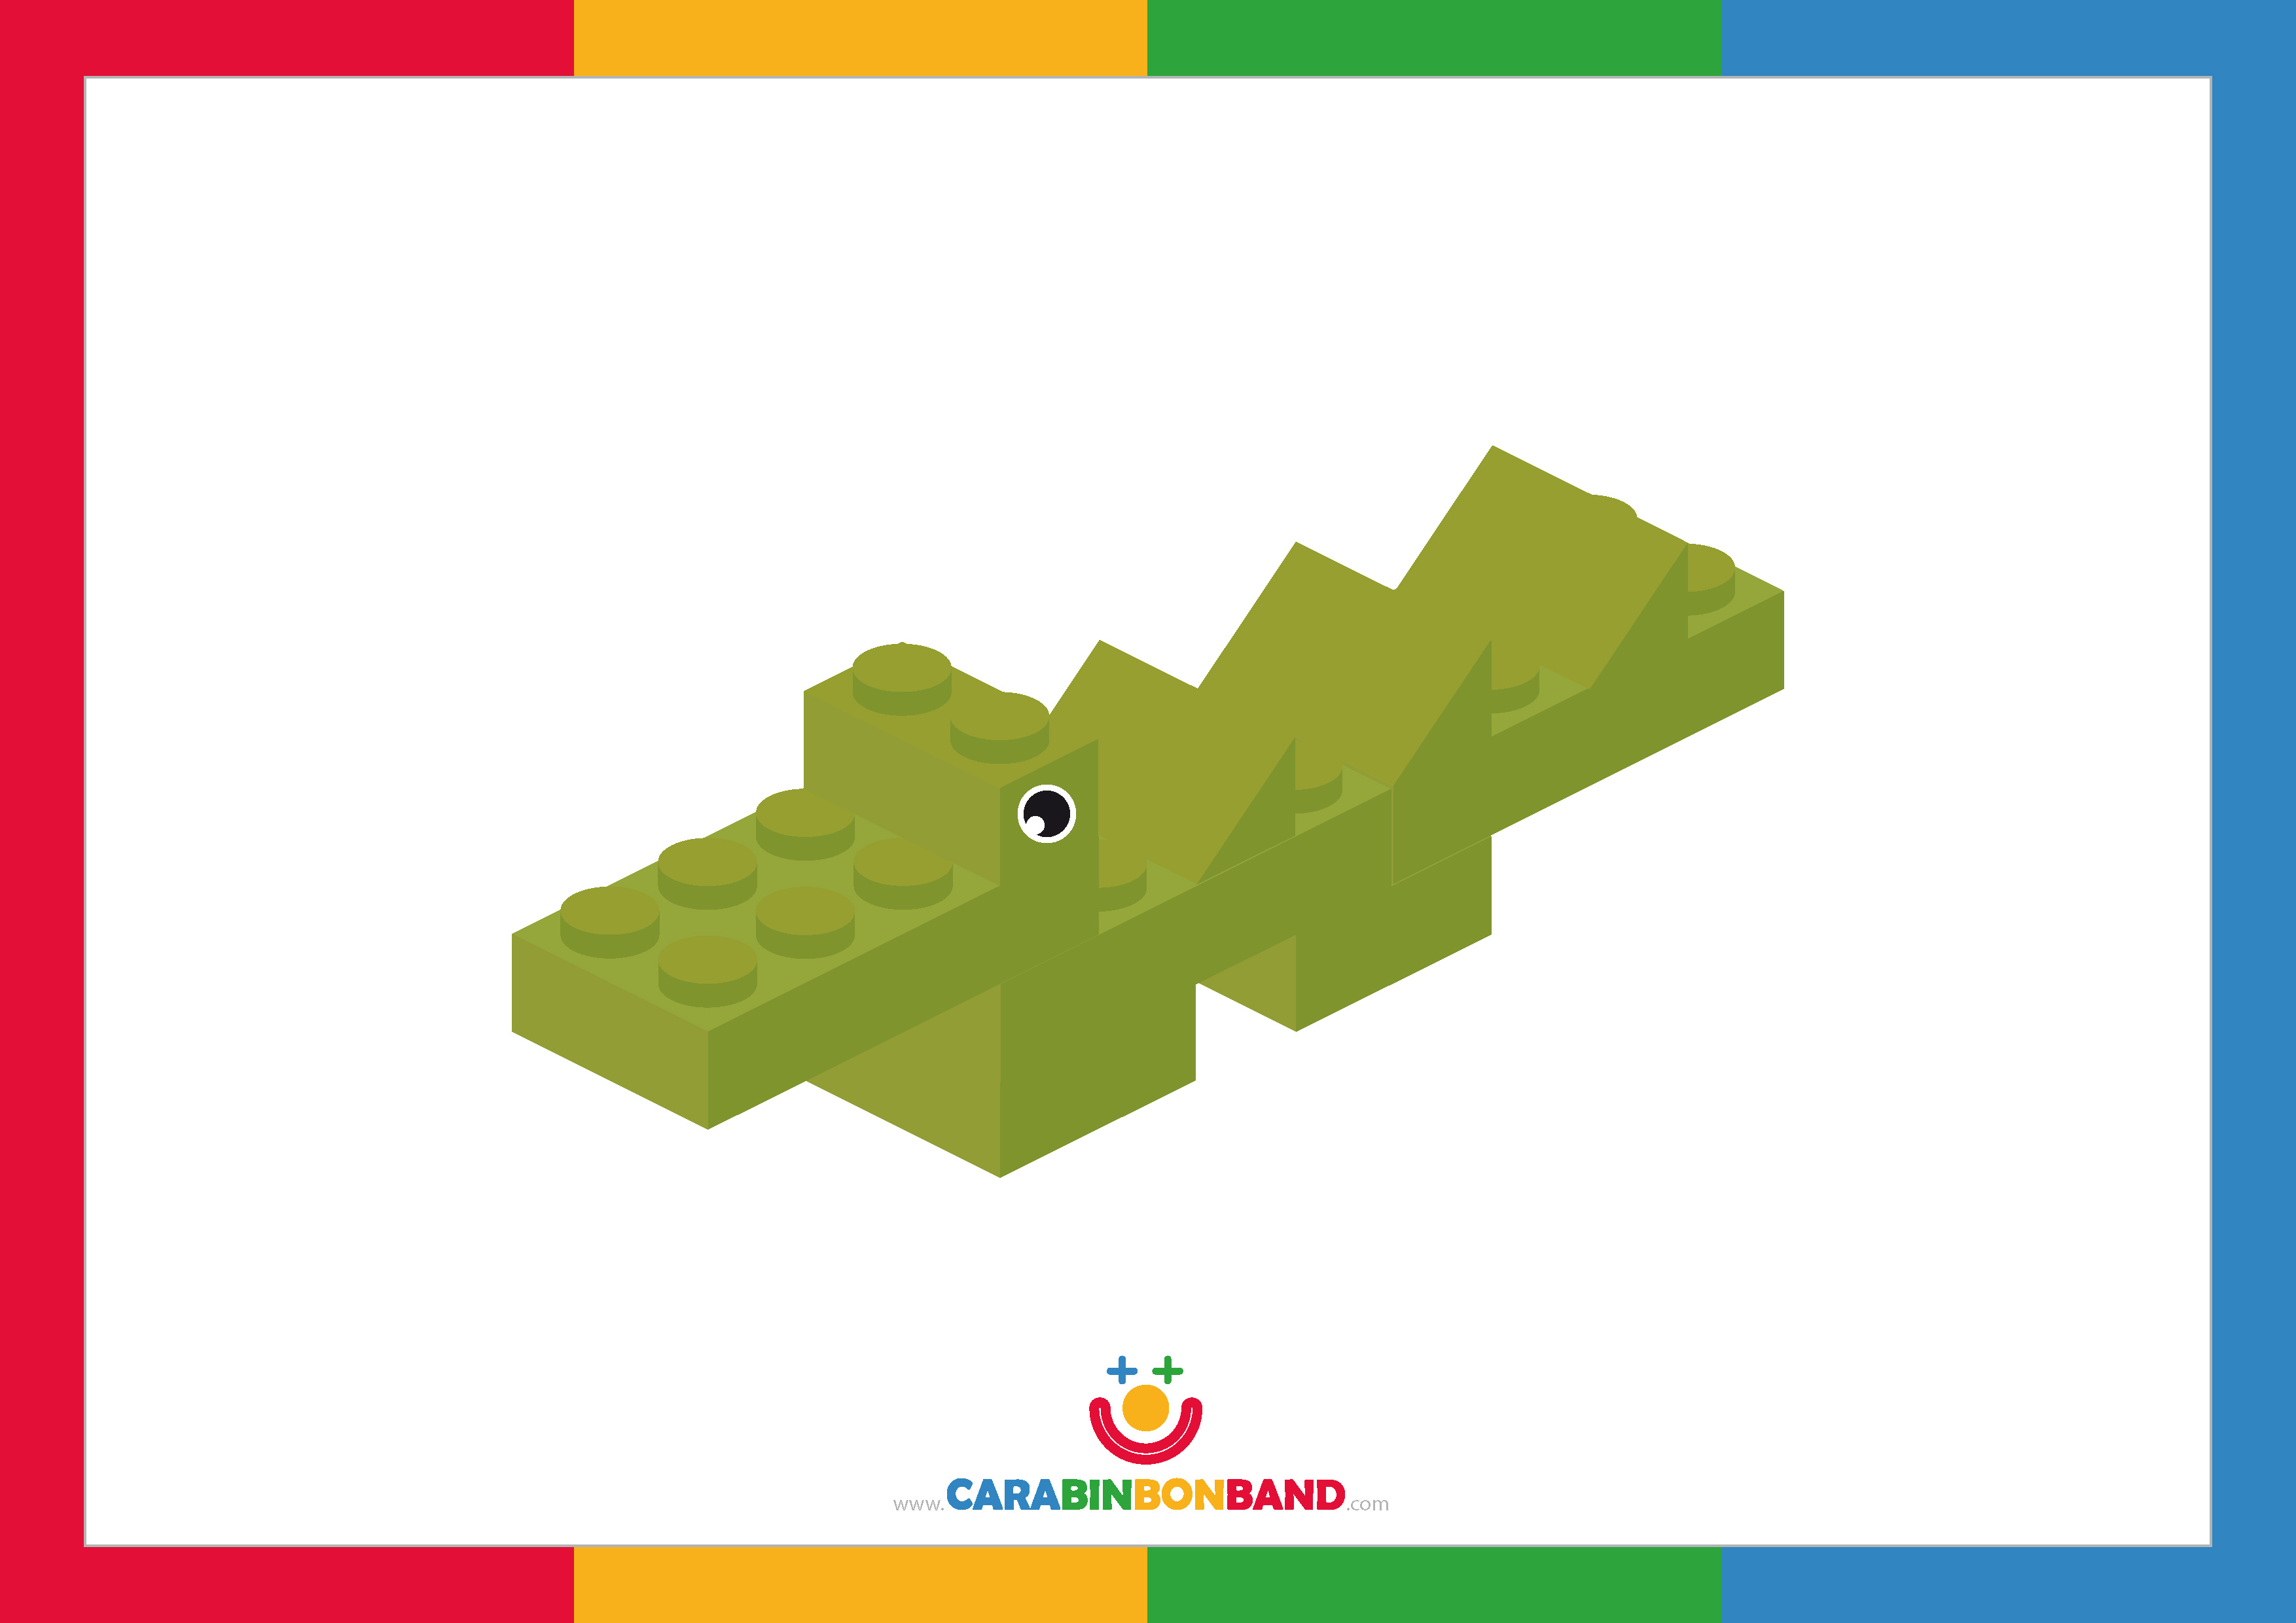 Láminas decorativas: cocodrilo Lego